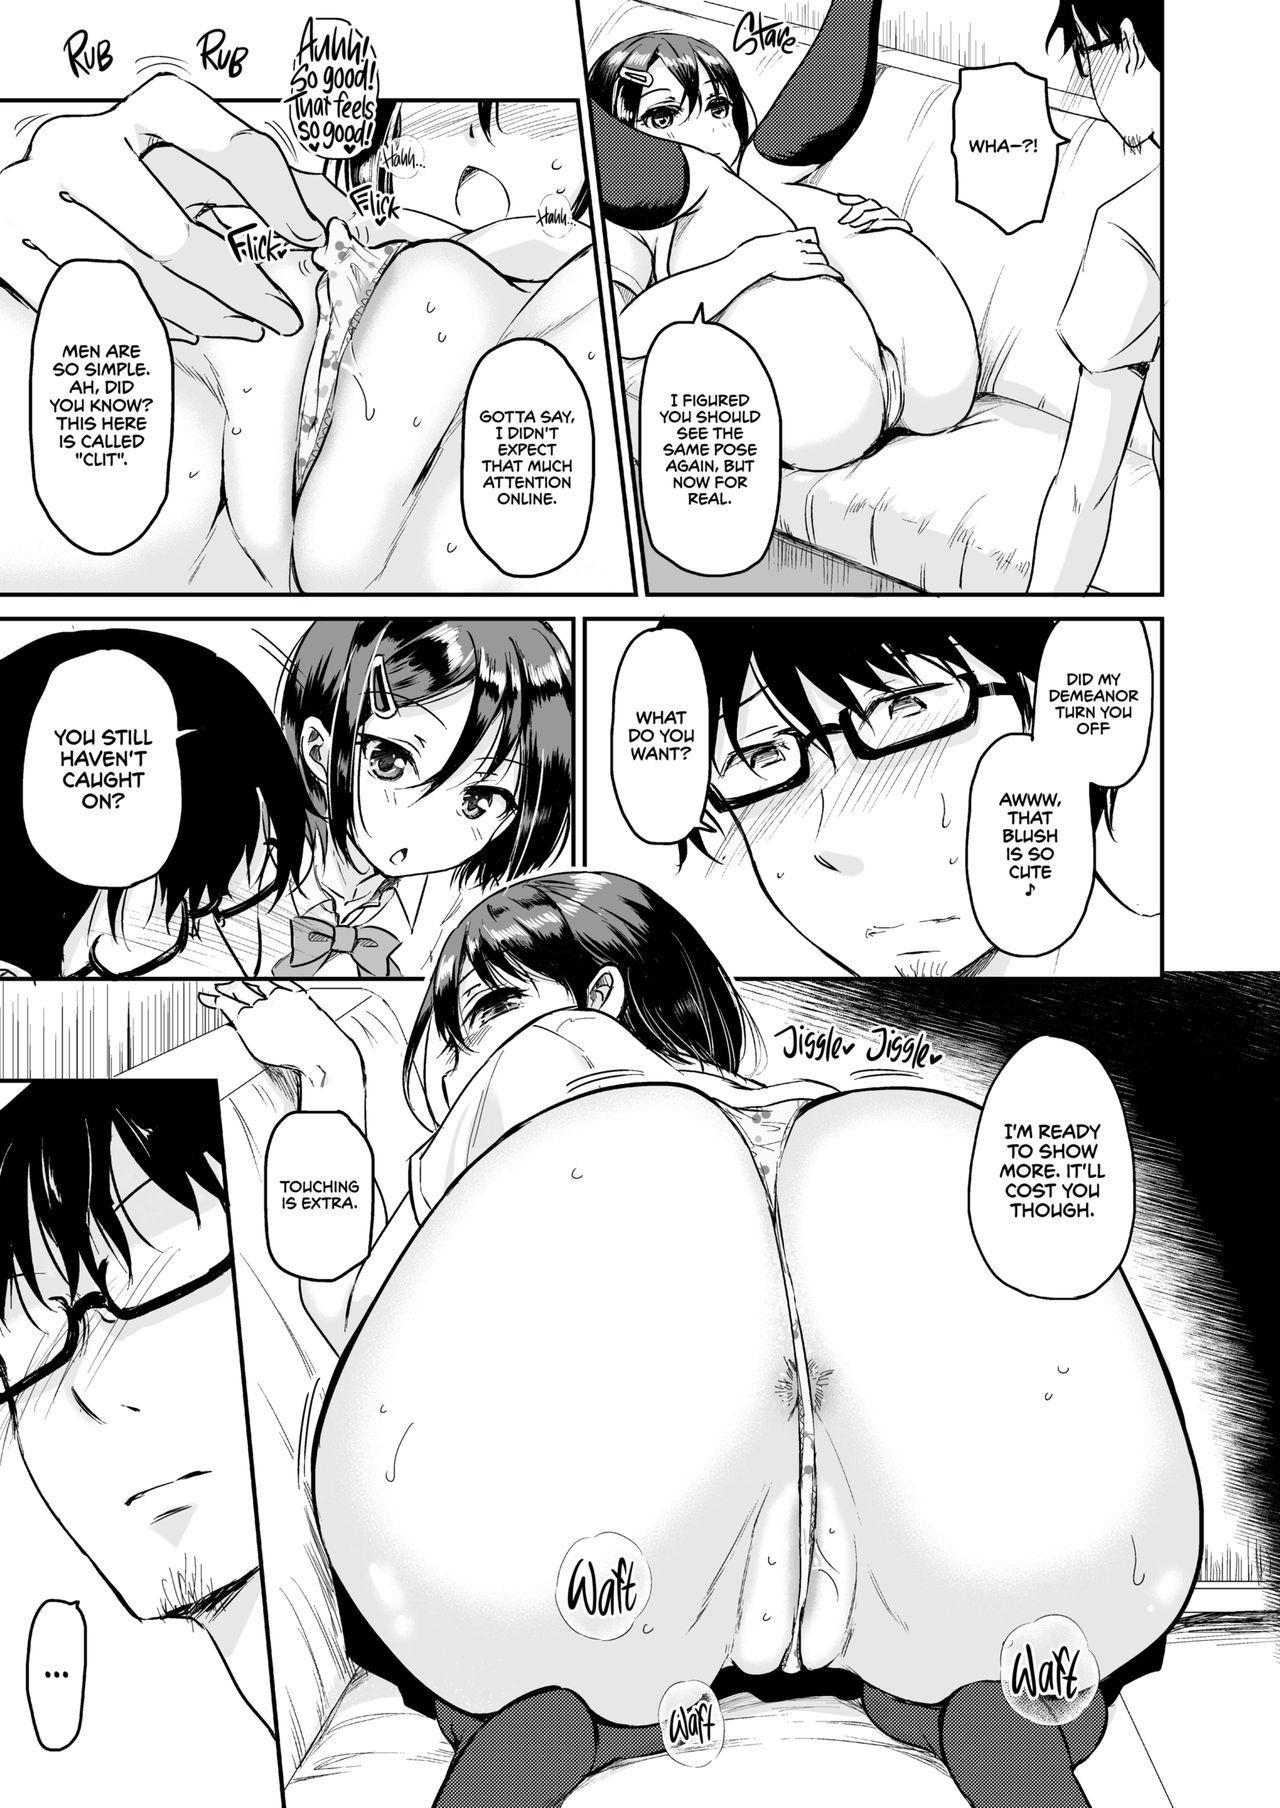 Choushi ni Notta JK ga Shinseki no Oji-san ni... | Clout Chasing 10